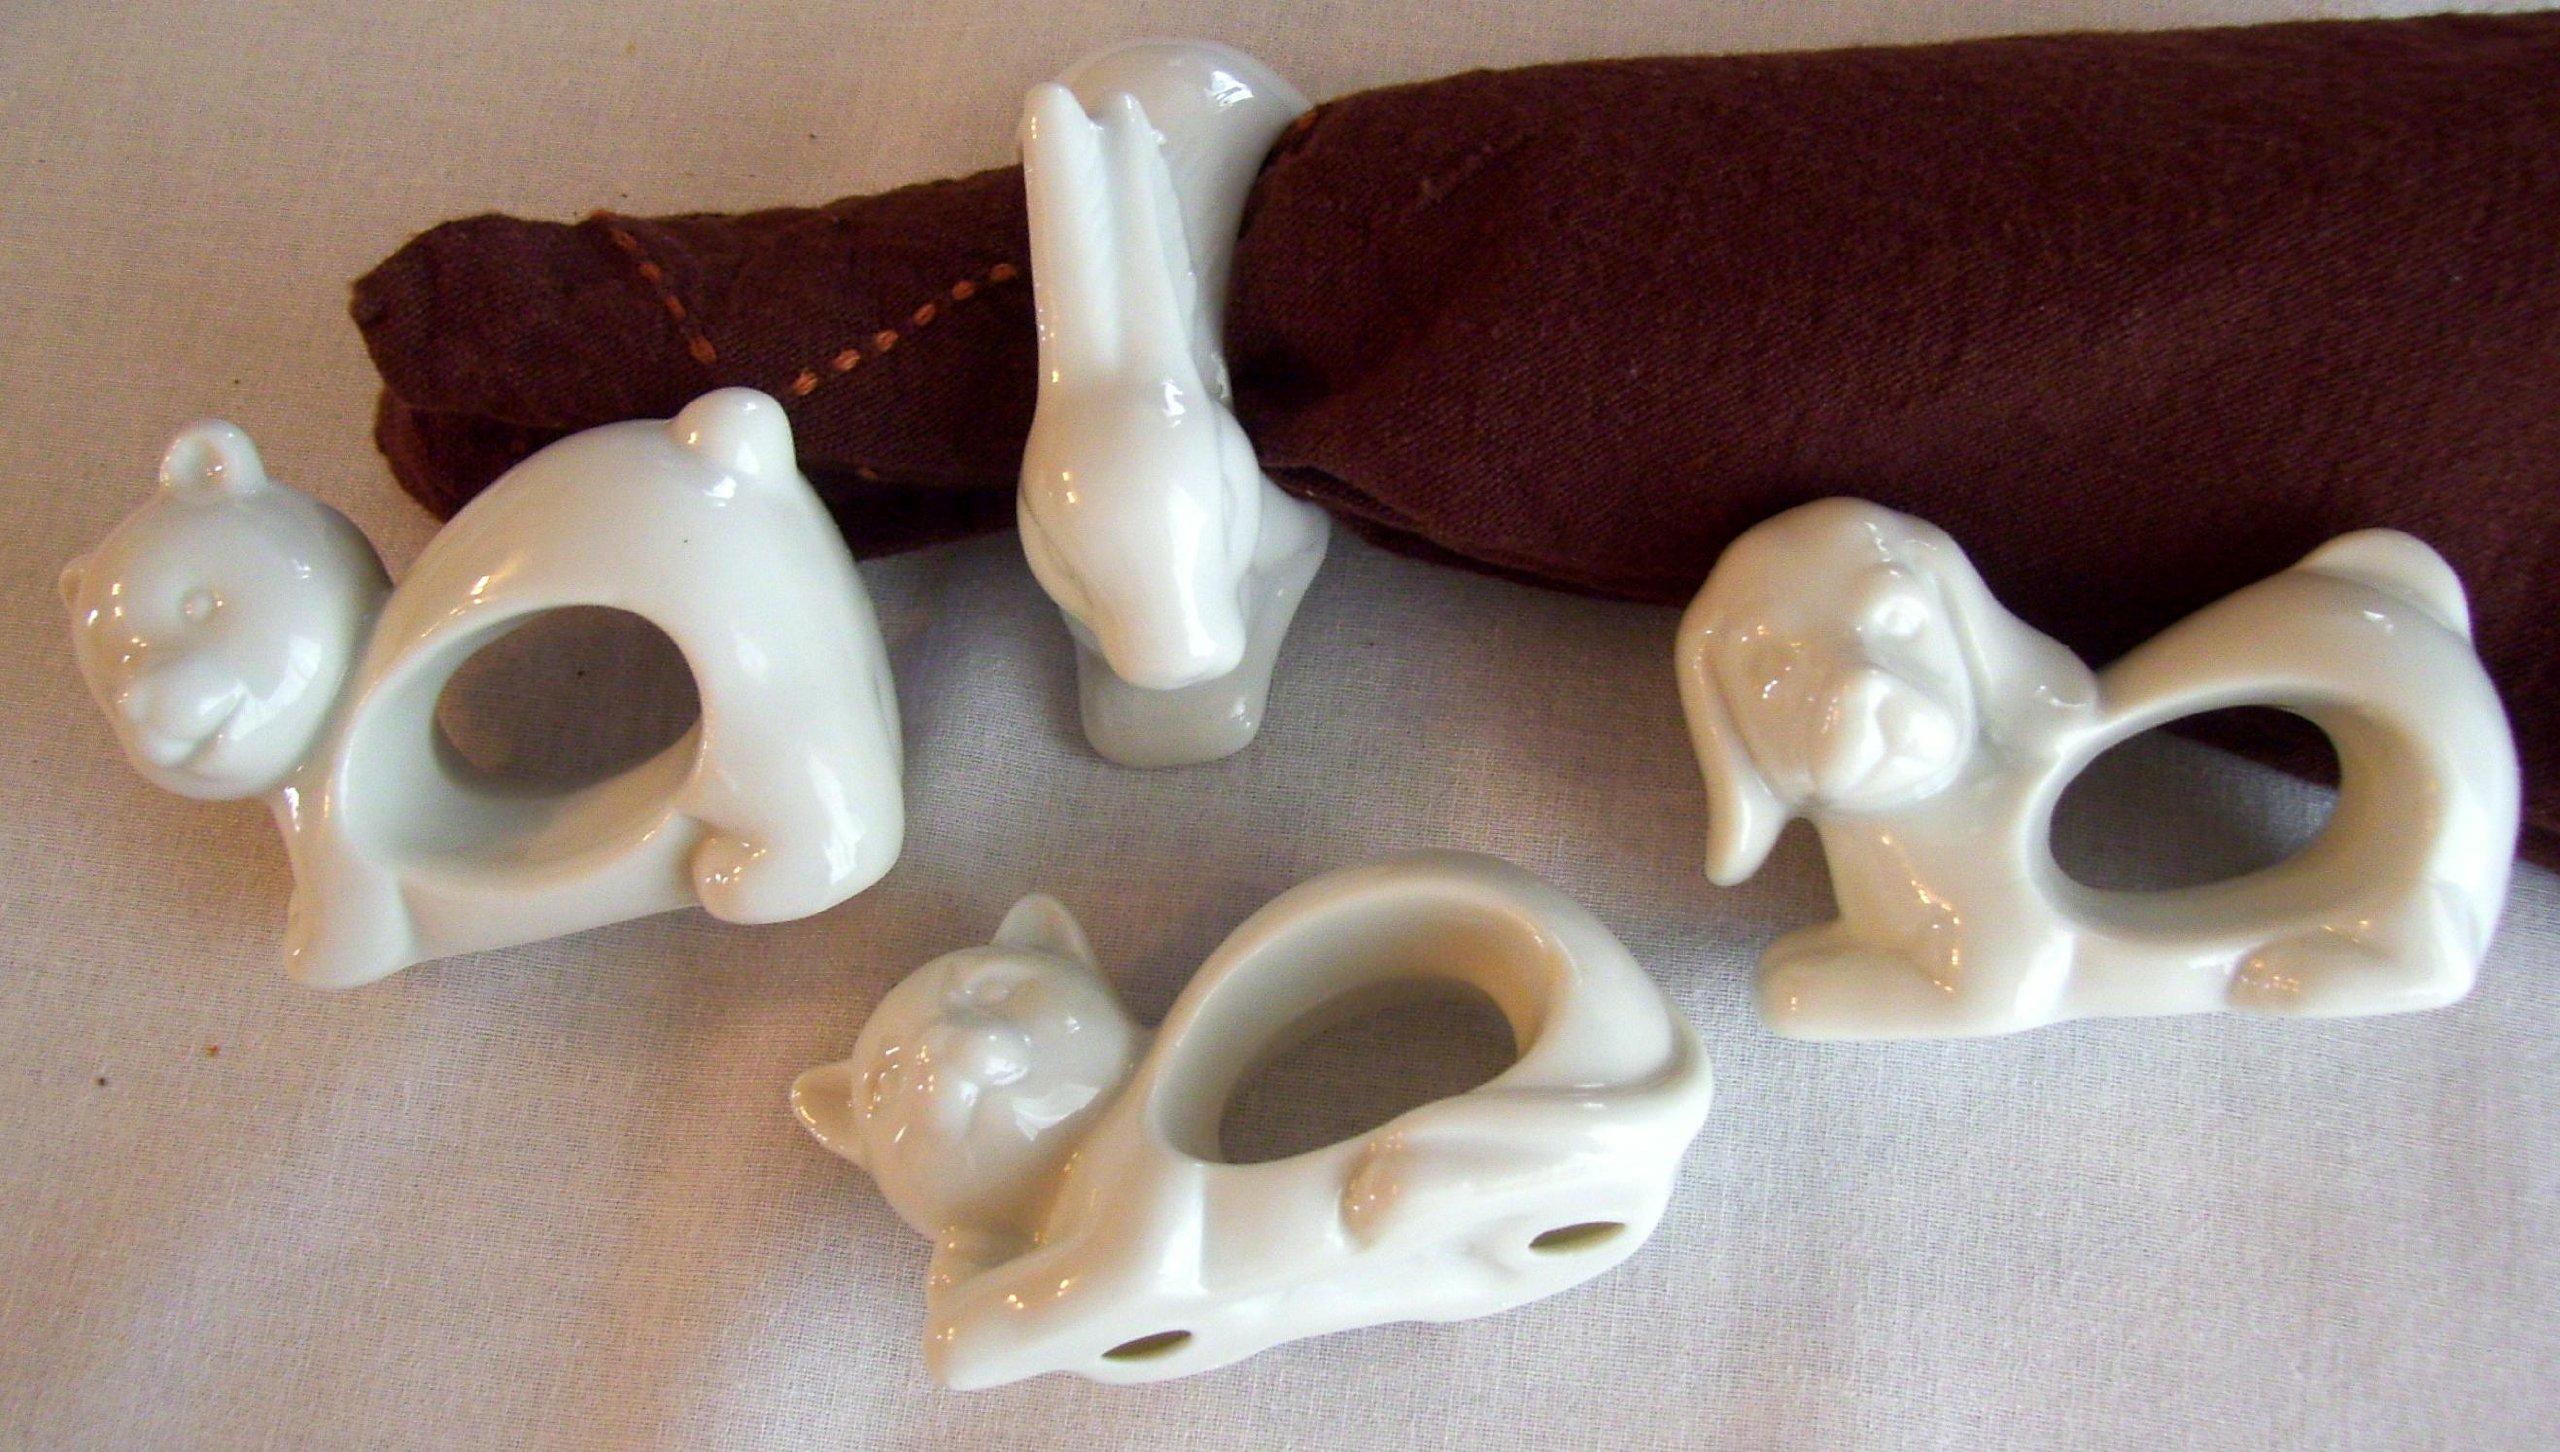 White Porcelain Animals Napkin Rings Set of 4